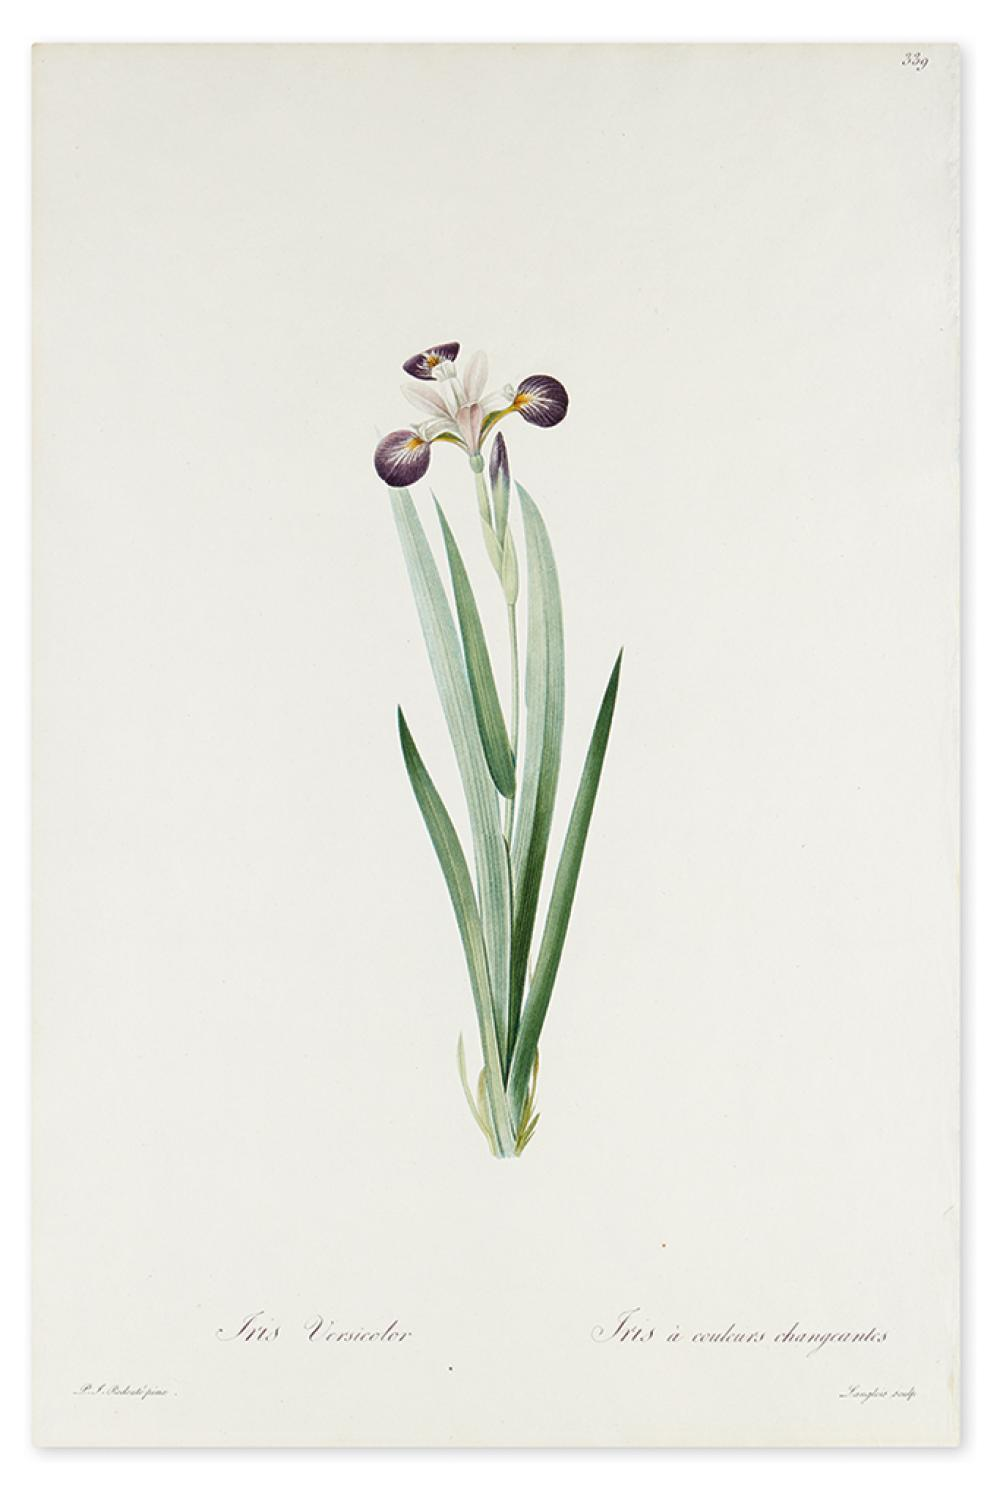 REDOUTÉ, PIERRE-JOSEPH. Iris Versicolor / Iris à couleurs changeantes [Purple Iris].